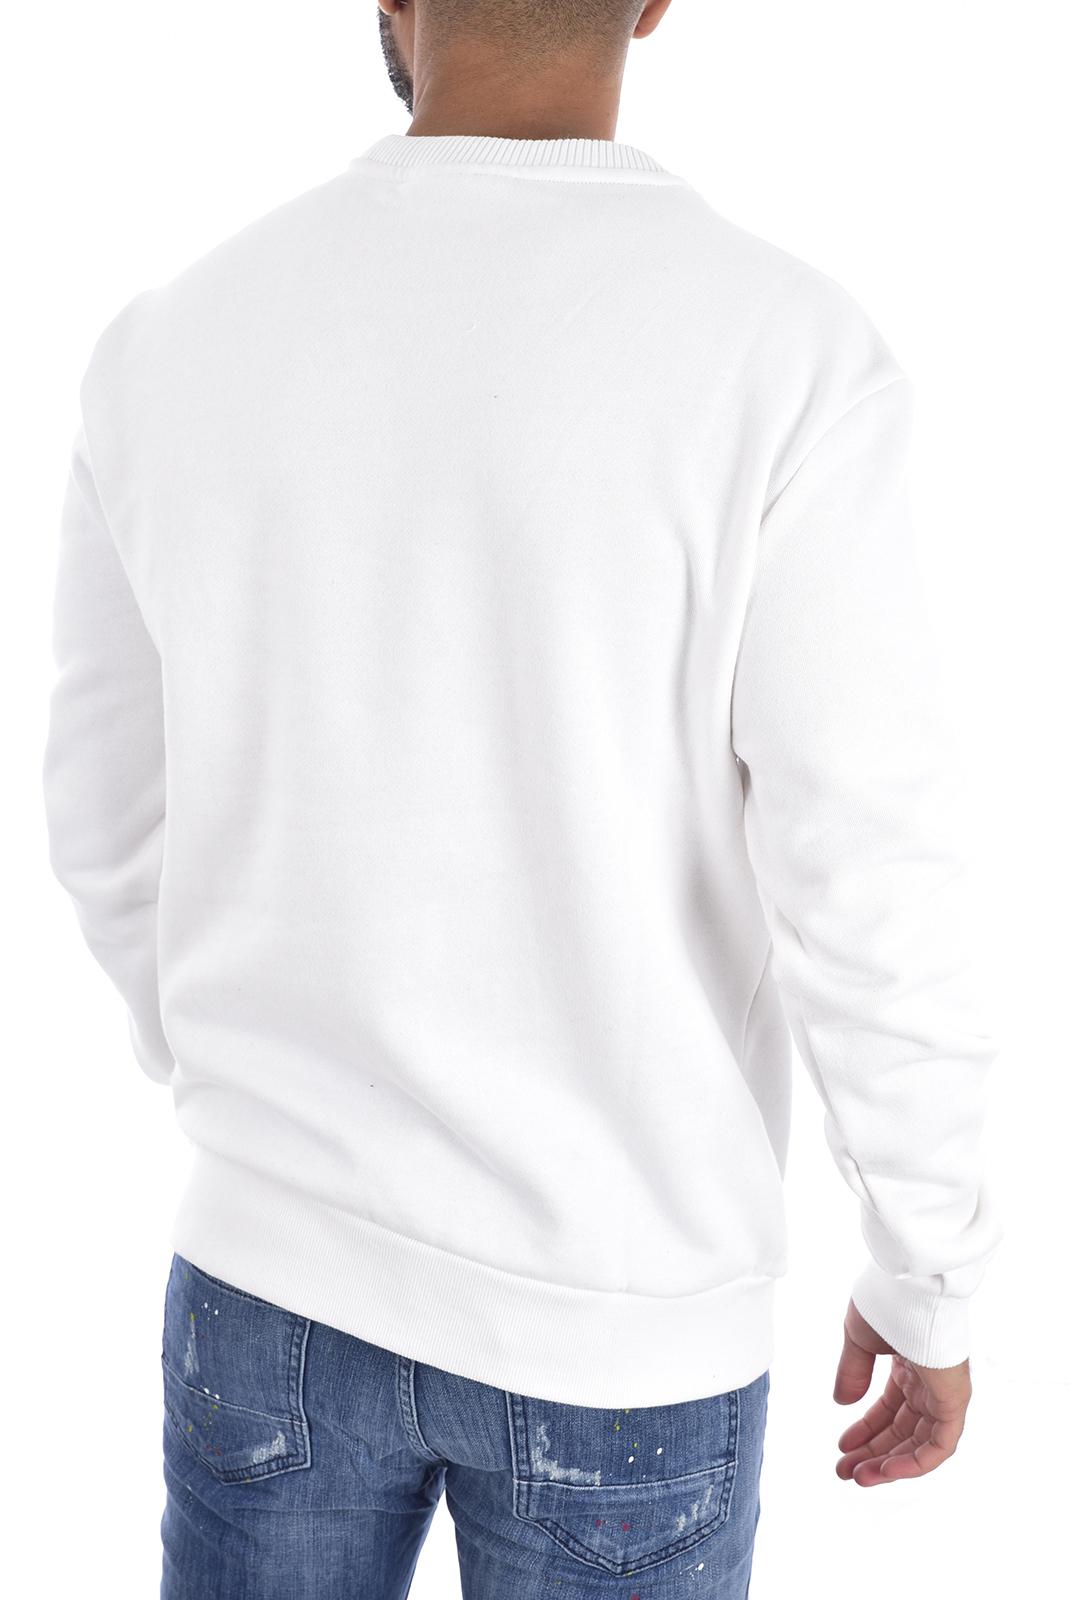 Sweatshirts  Fila 684475 leroy 1 WHITE